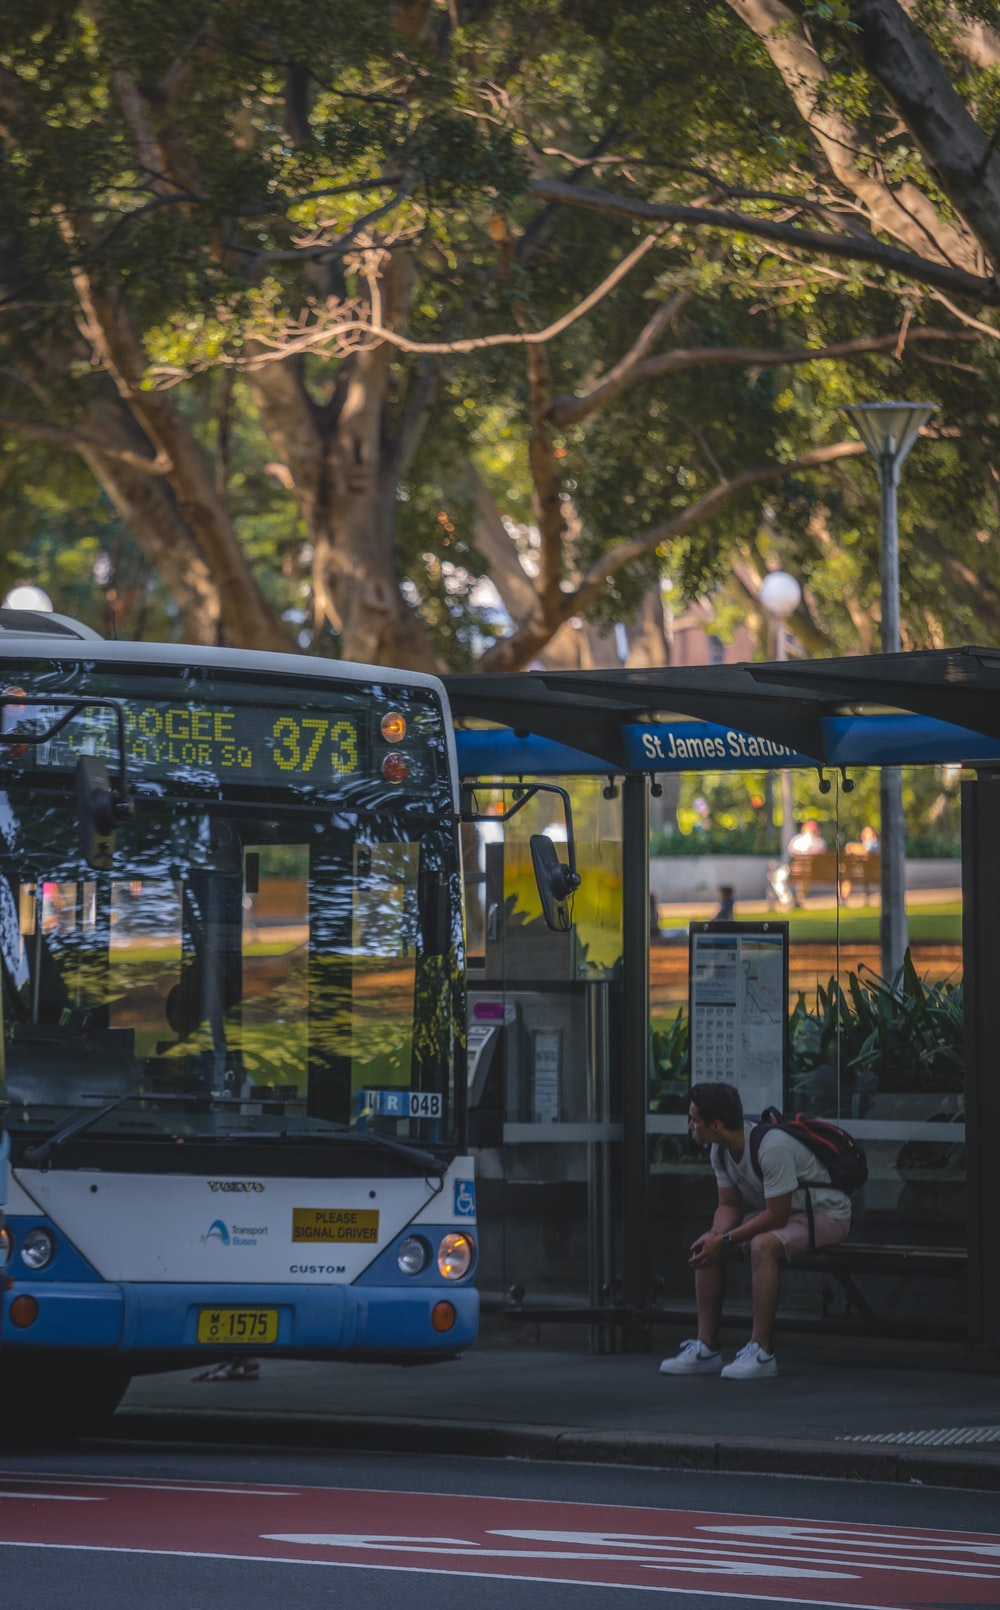 people sitting on bench near bus during daytime